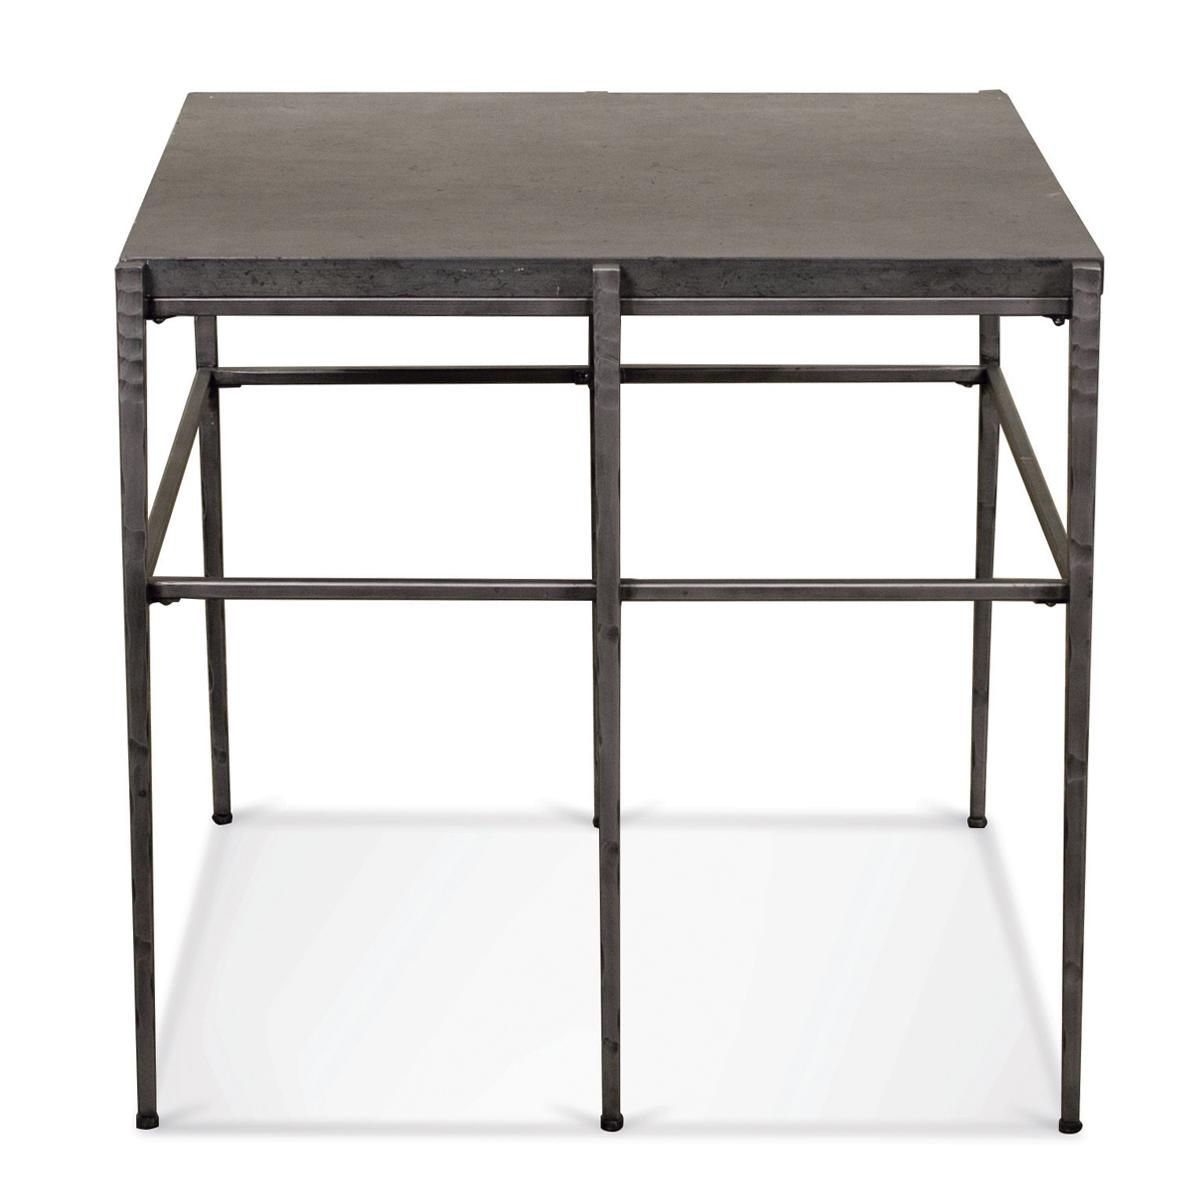 Riverside Furniture Lorraine End Table - Item Number: 11609